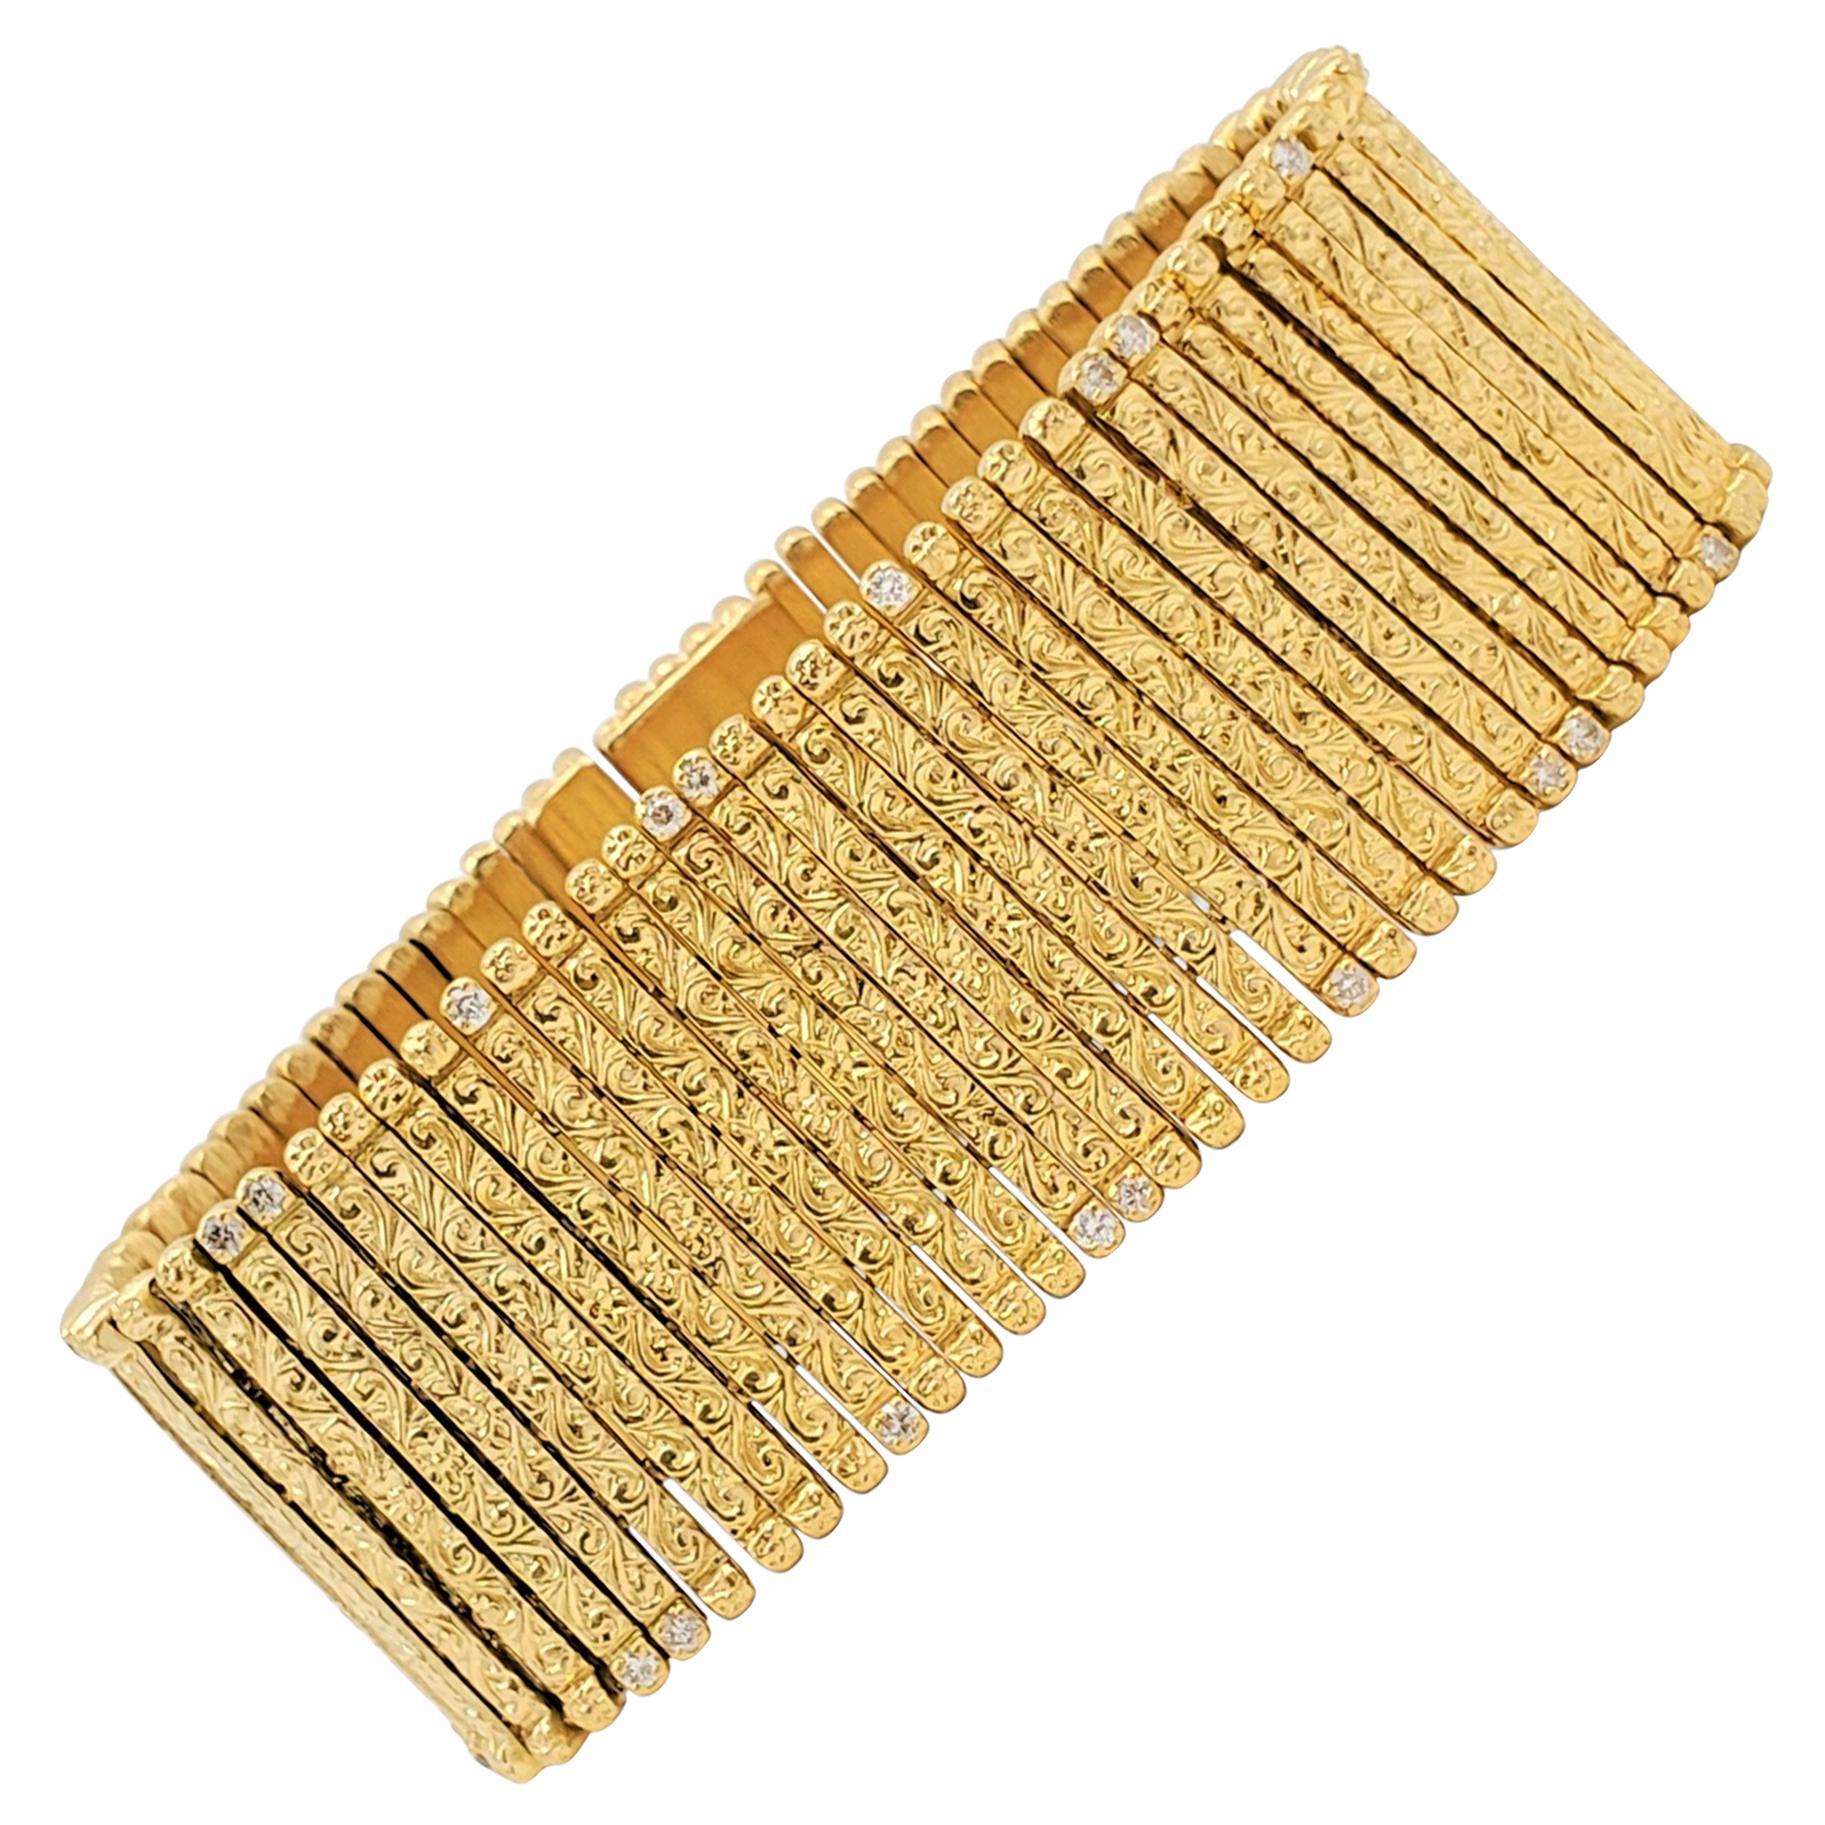 Roberto Coin Yellow Gold and Diamond Flexible Bracelet